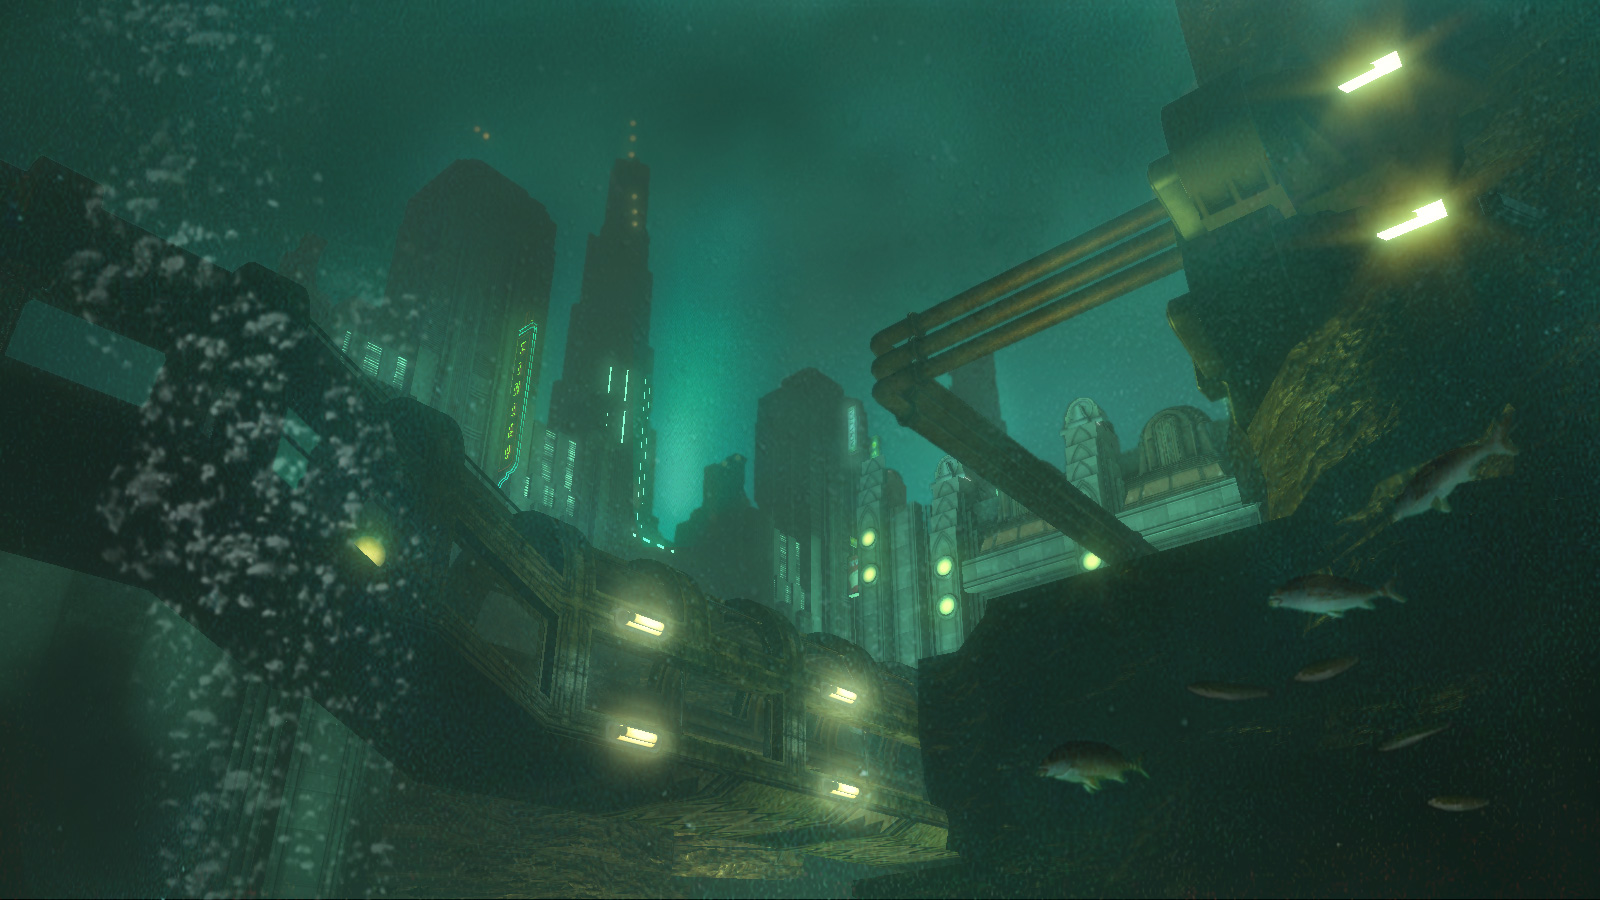 Rapture City from Bioshock